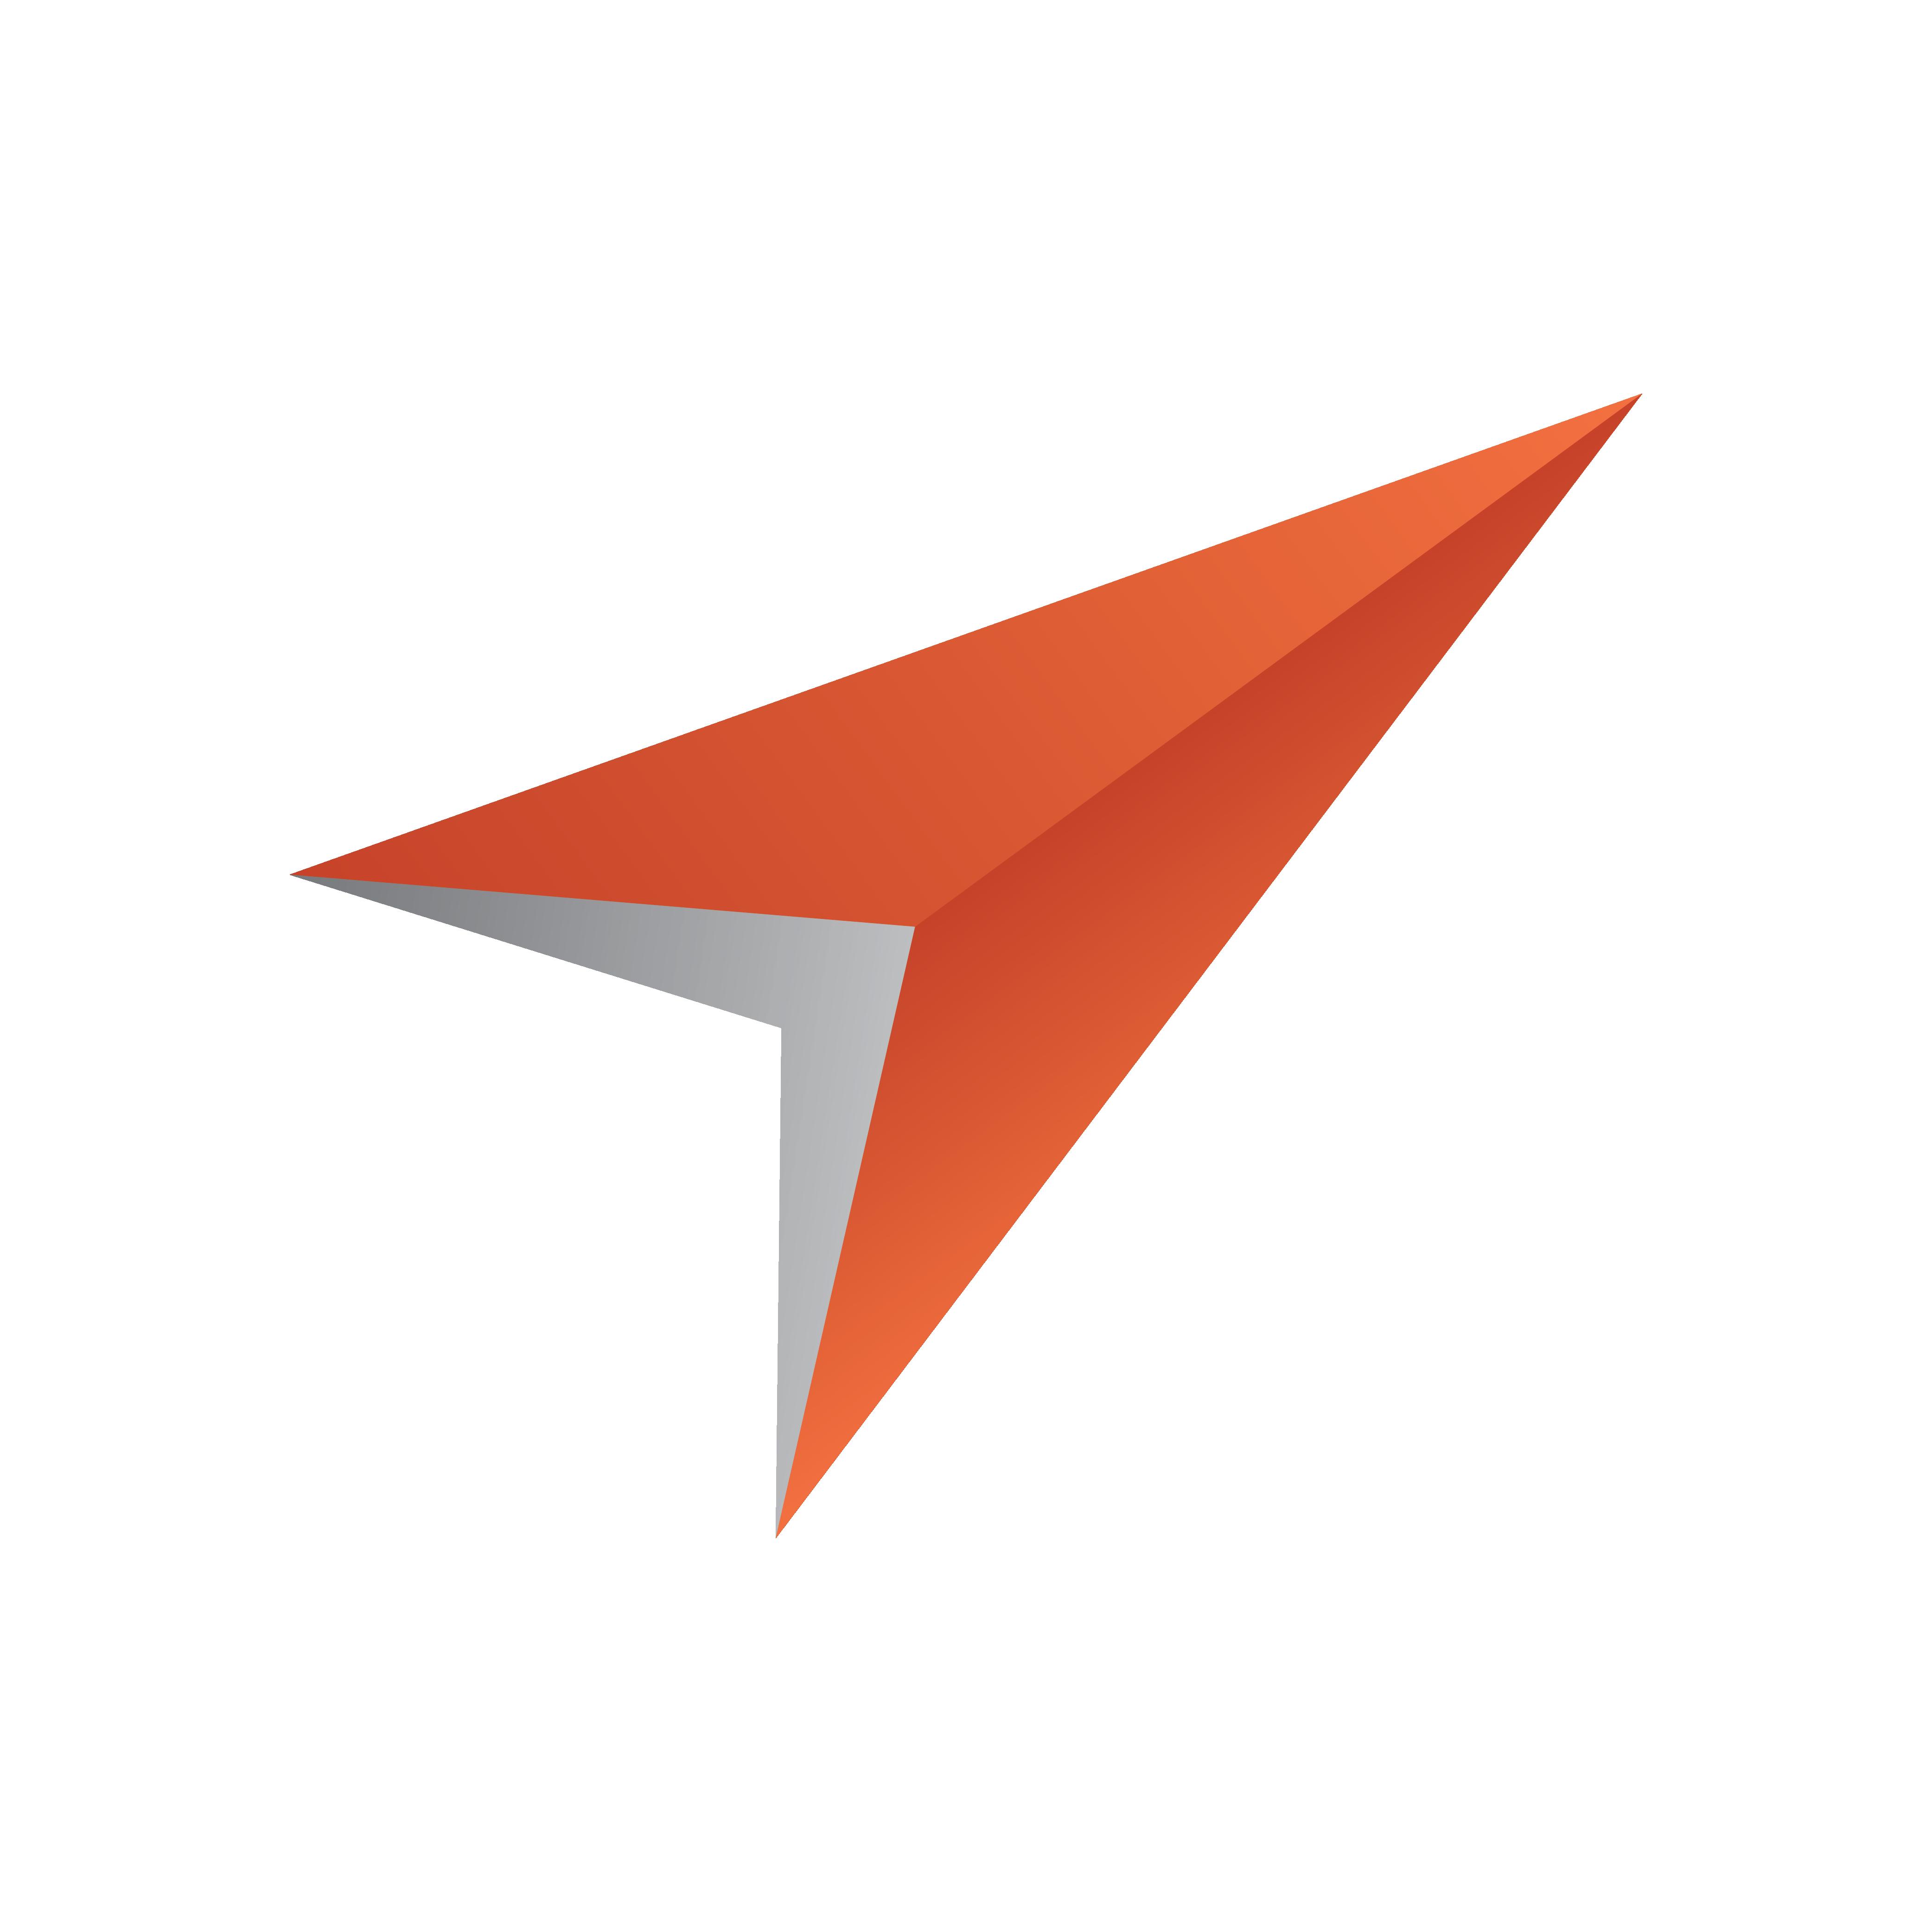 Introduction - Viz Pilot Edge